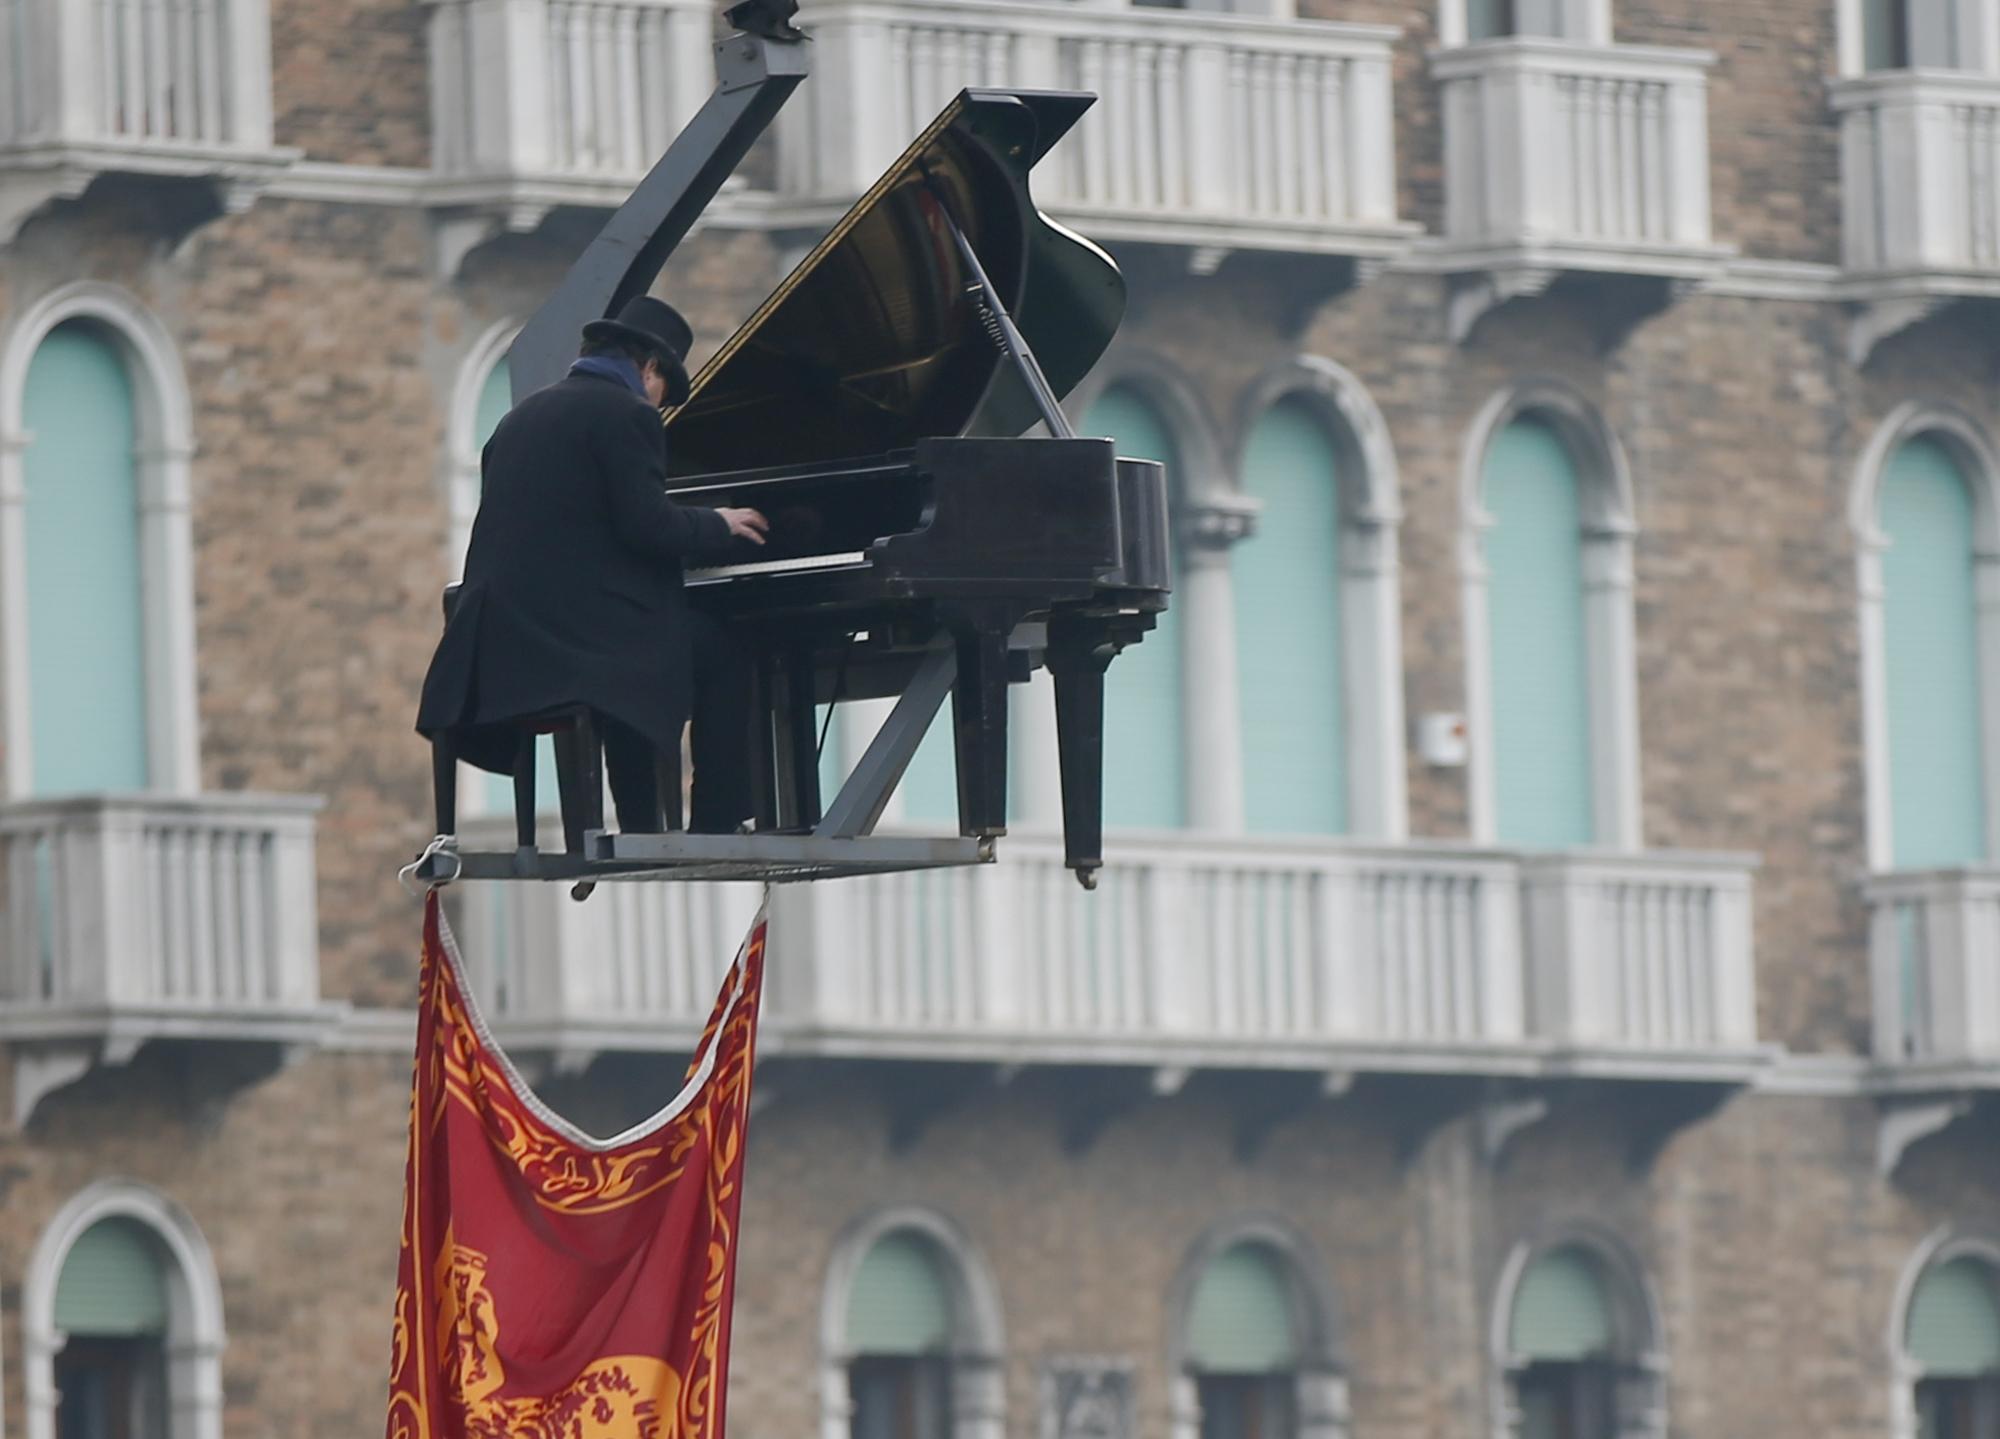 Pianista Paolo Zanarella parece flutuar em performance no Carnaval de Veneza neste domingo (24)